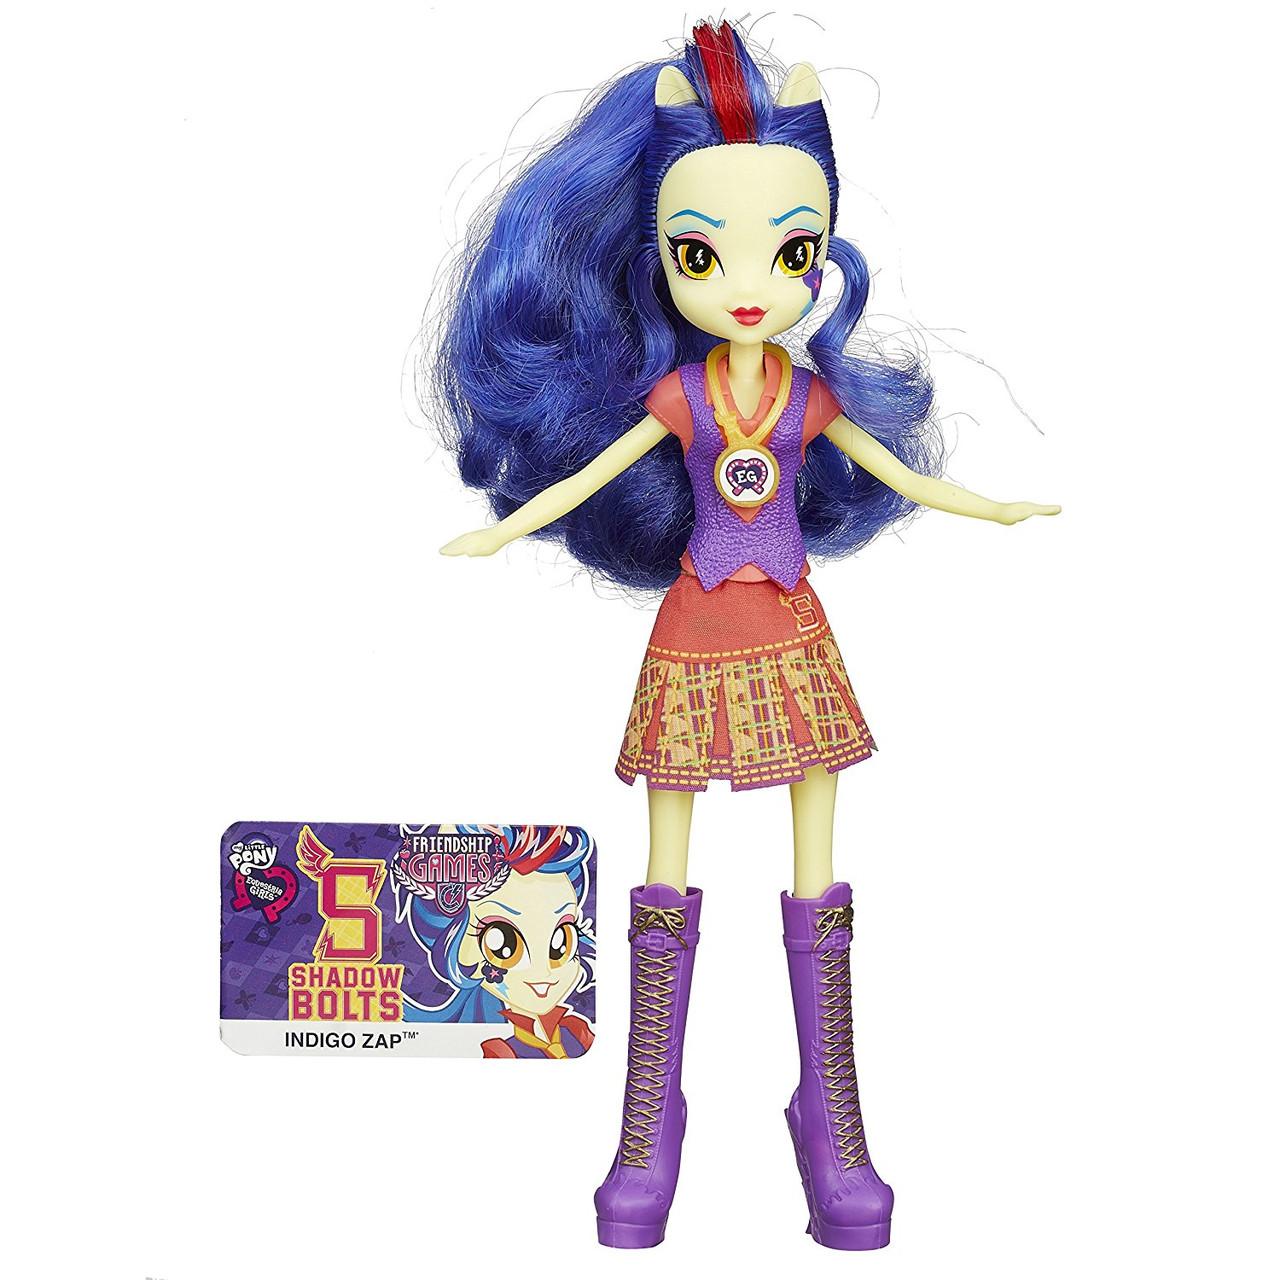 Кукла Эквестрия Оригинал Индиго Зап Май литл пони герлз, My Little Pony Equestria Girls (B5723AS0)